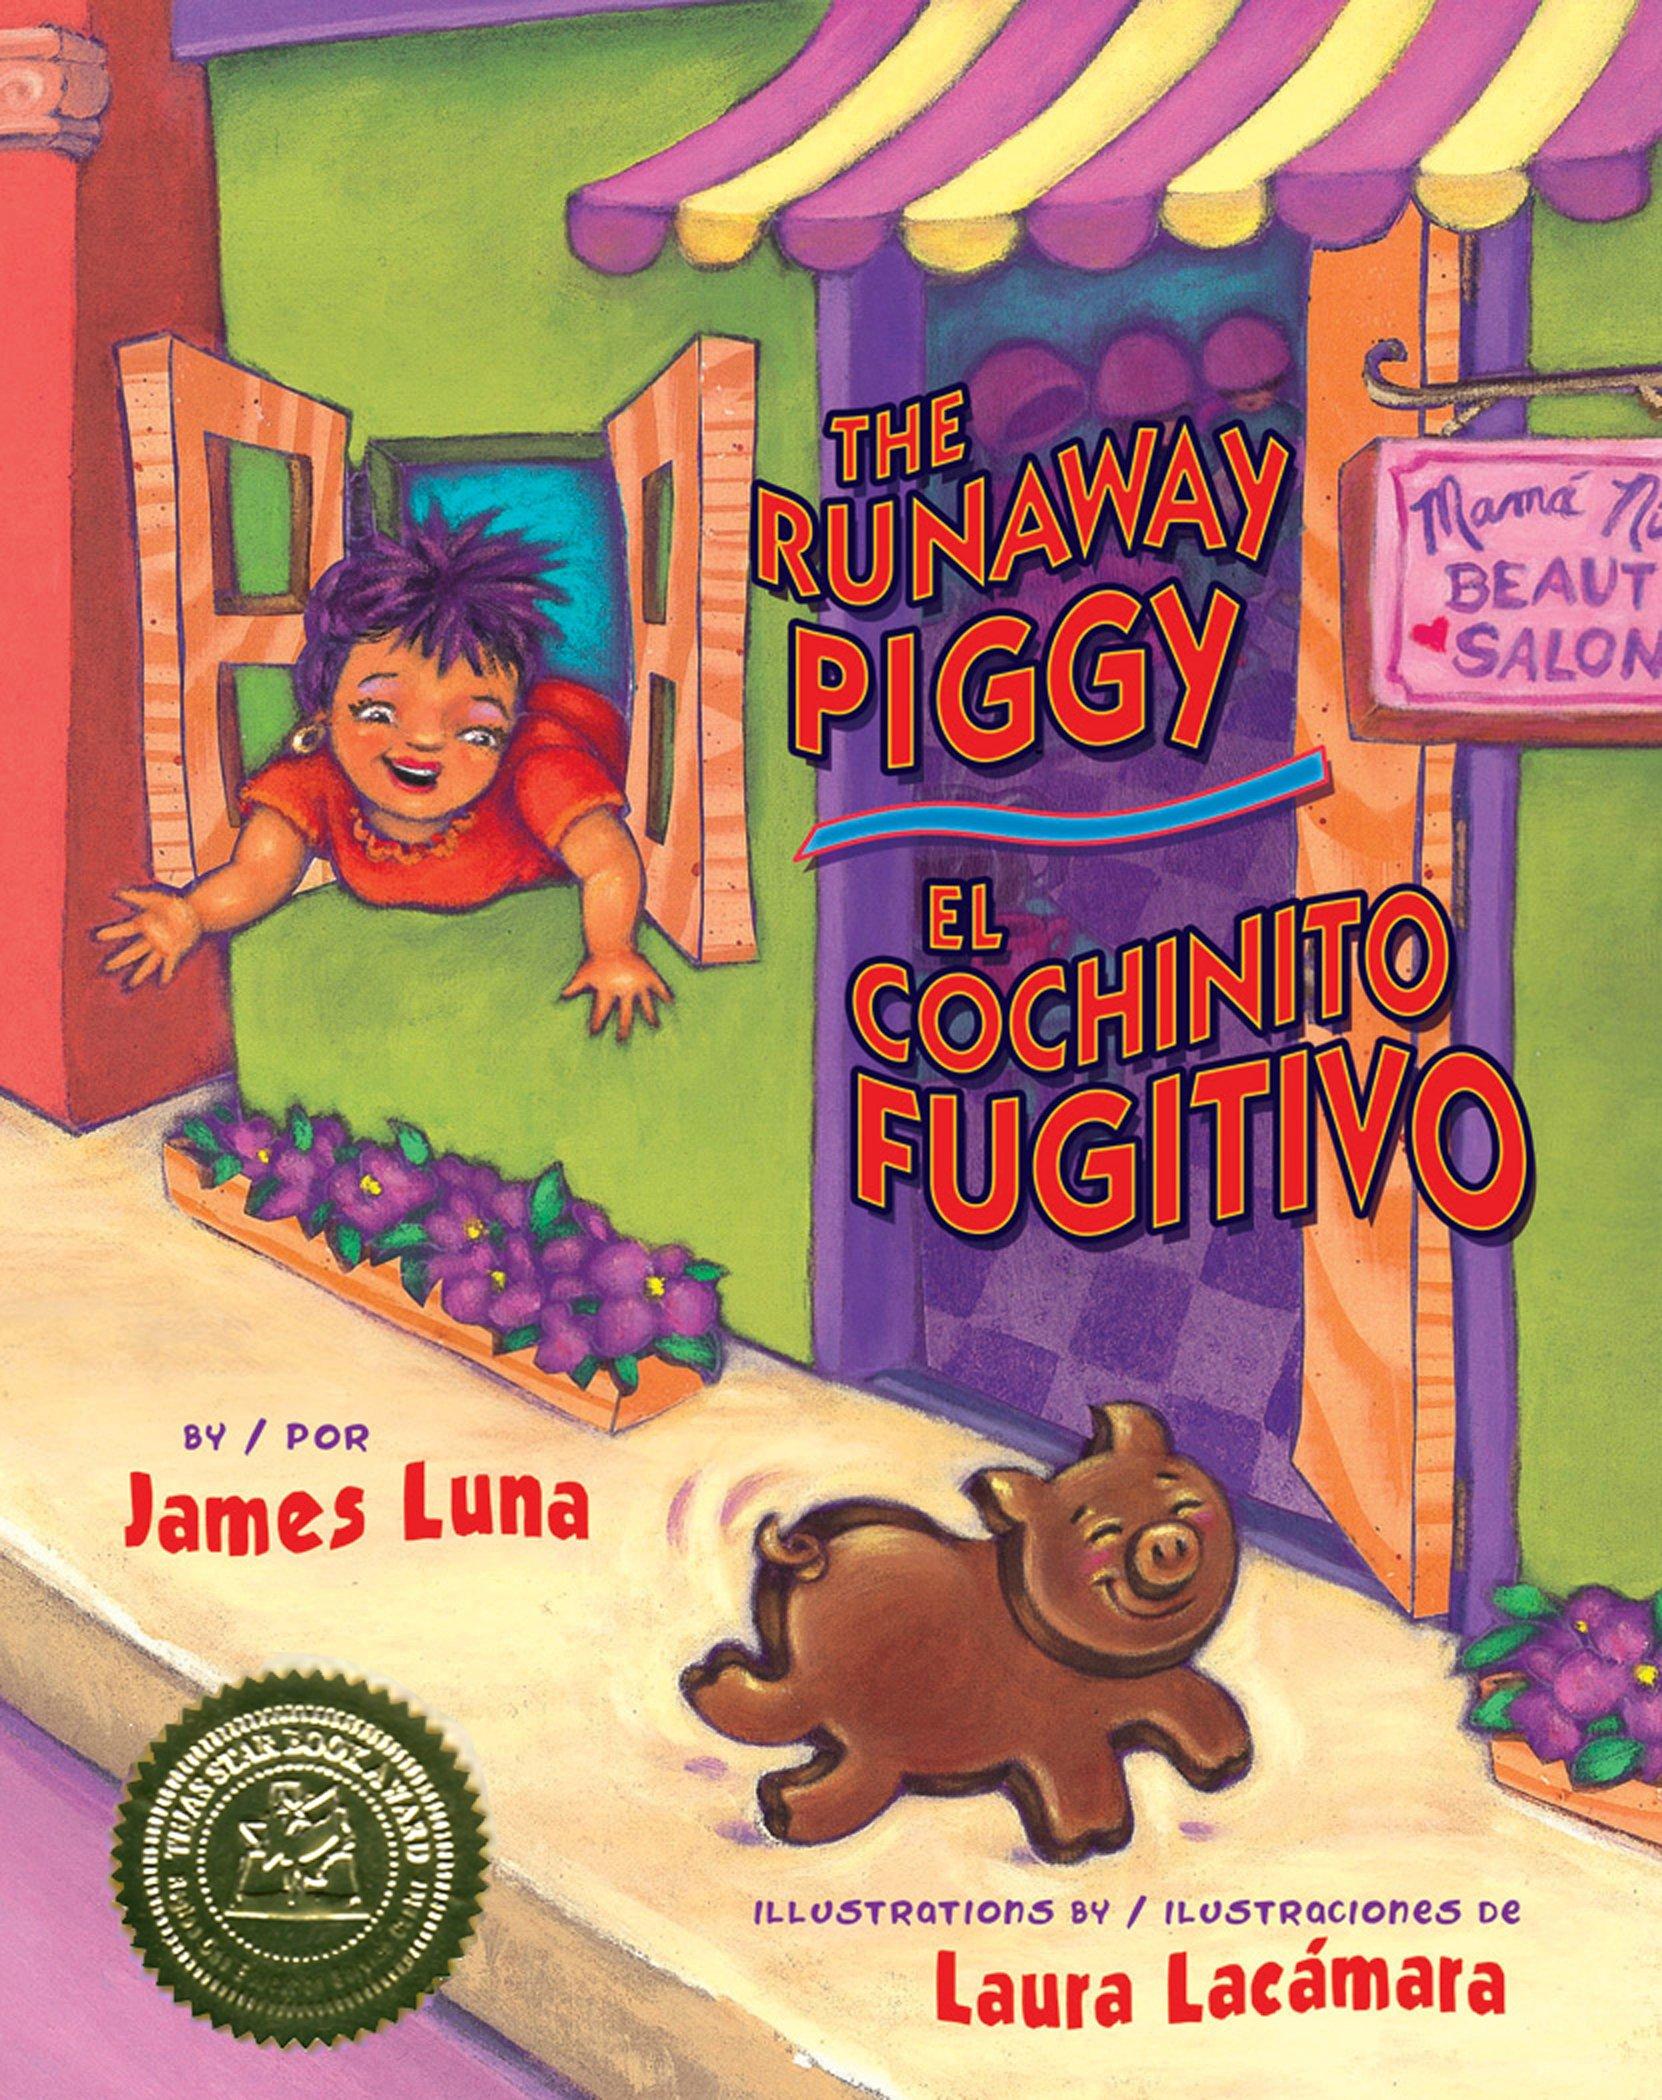 The Runaway Piggy El Cochinito Fugitivo English And Spanish